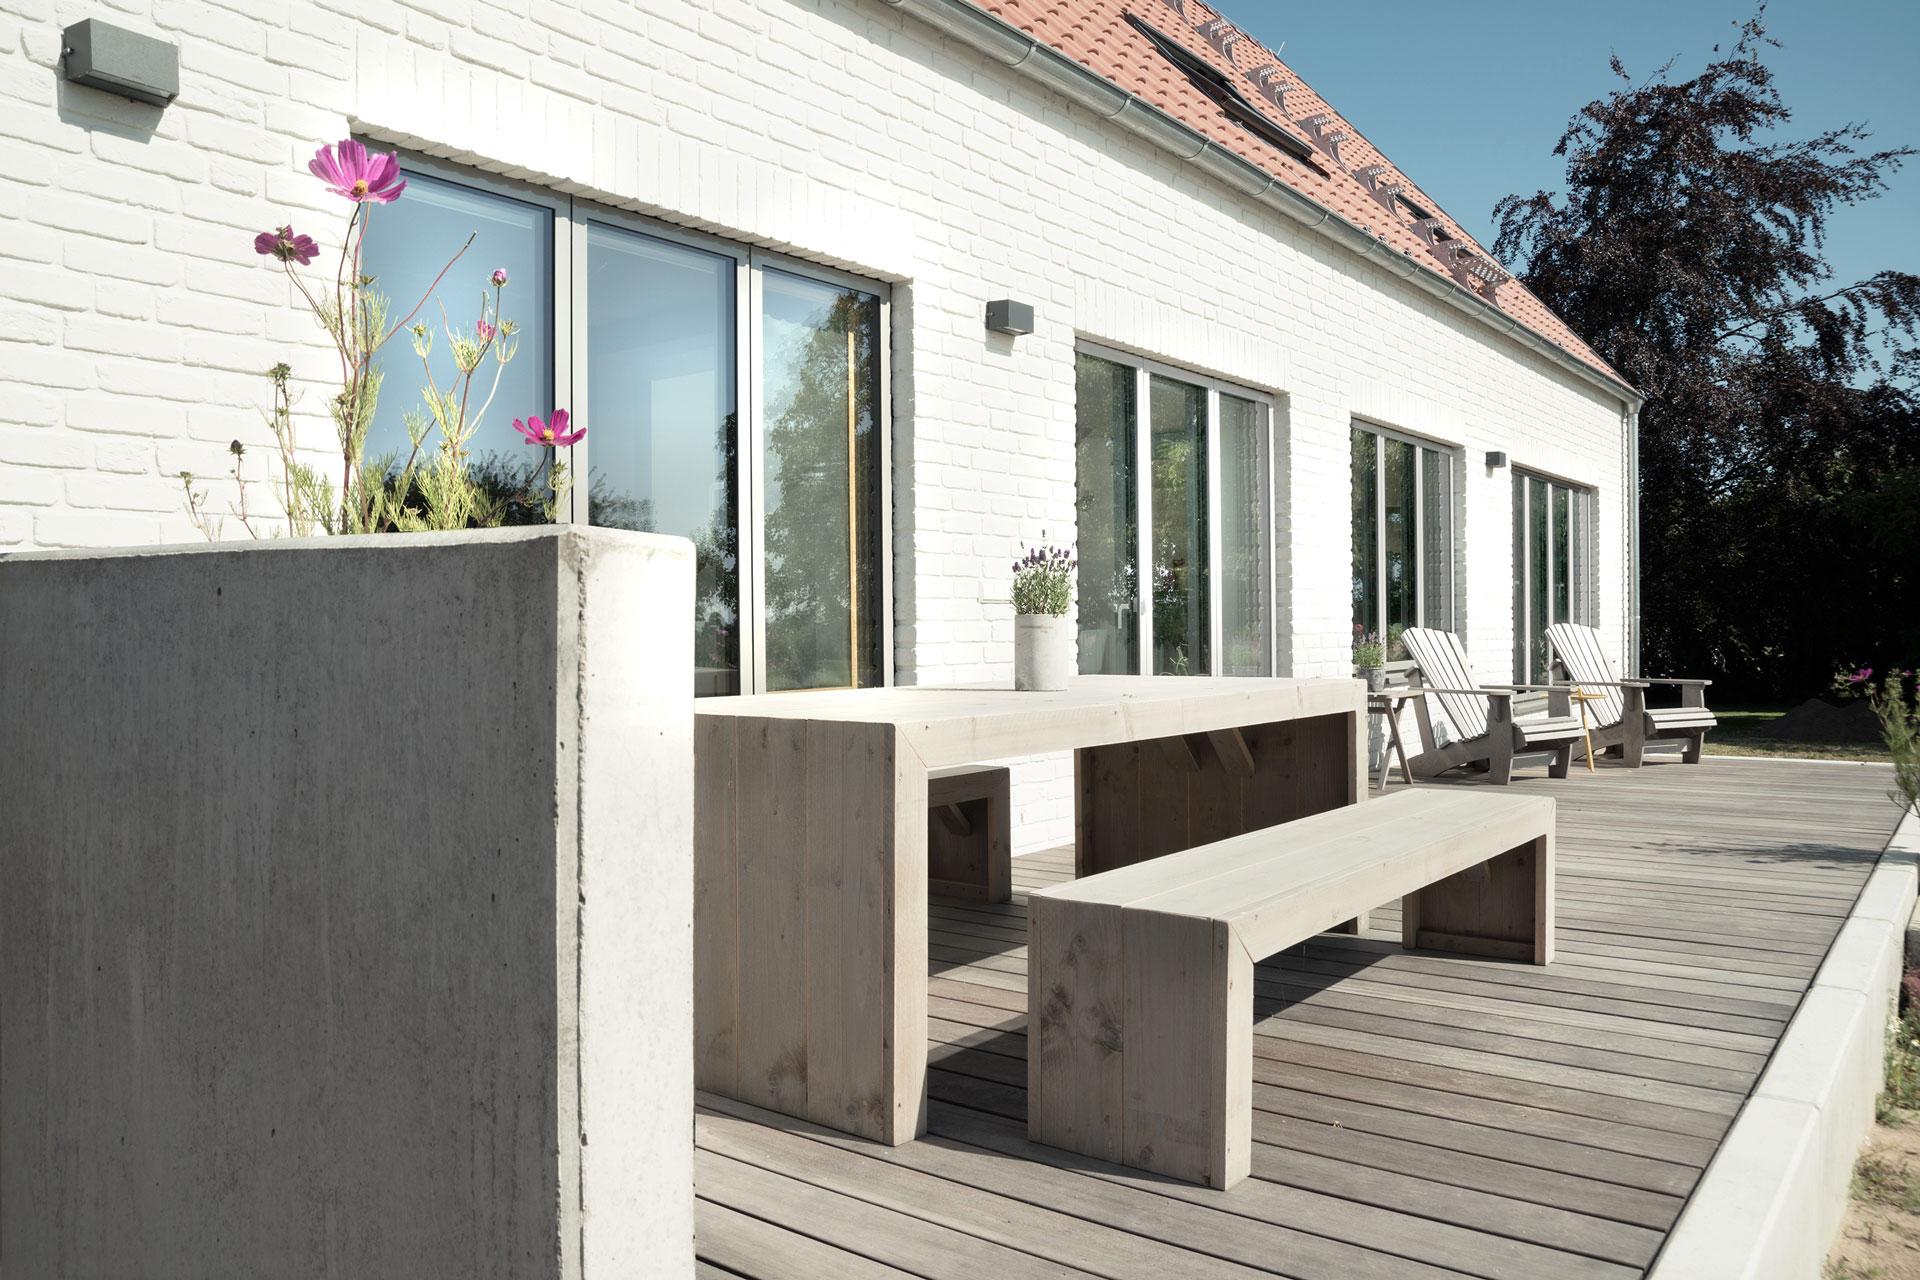 Terrasse im Landkreis NWM (03) / Nahaufnahme